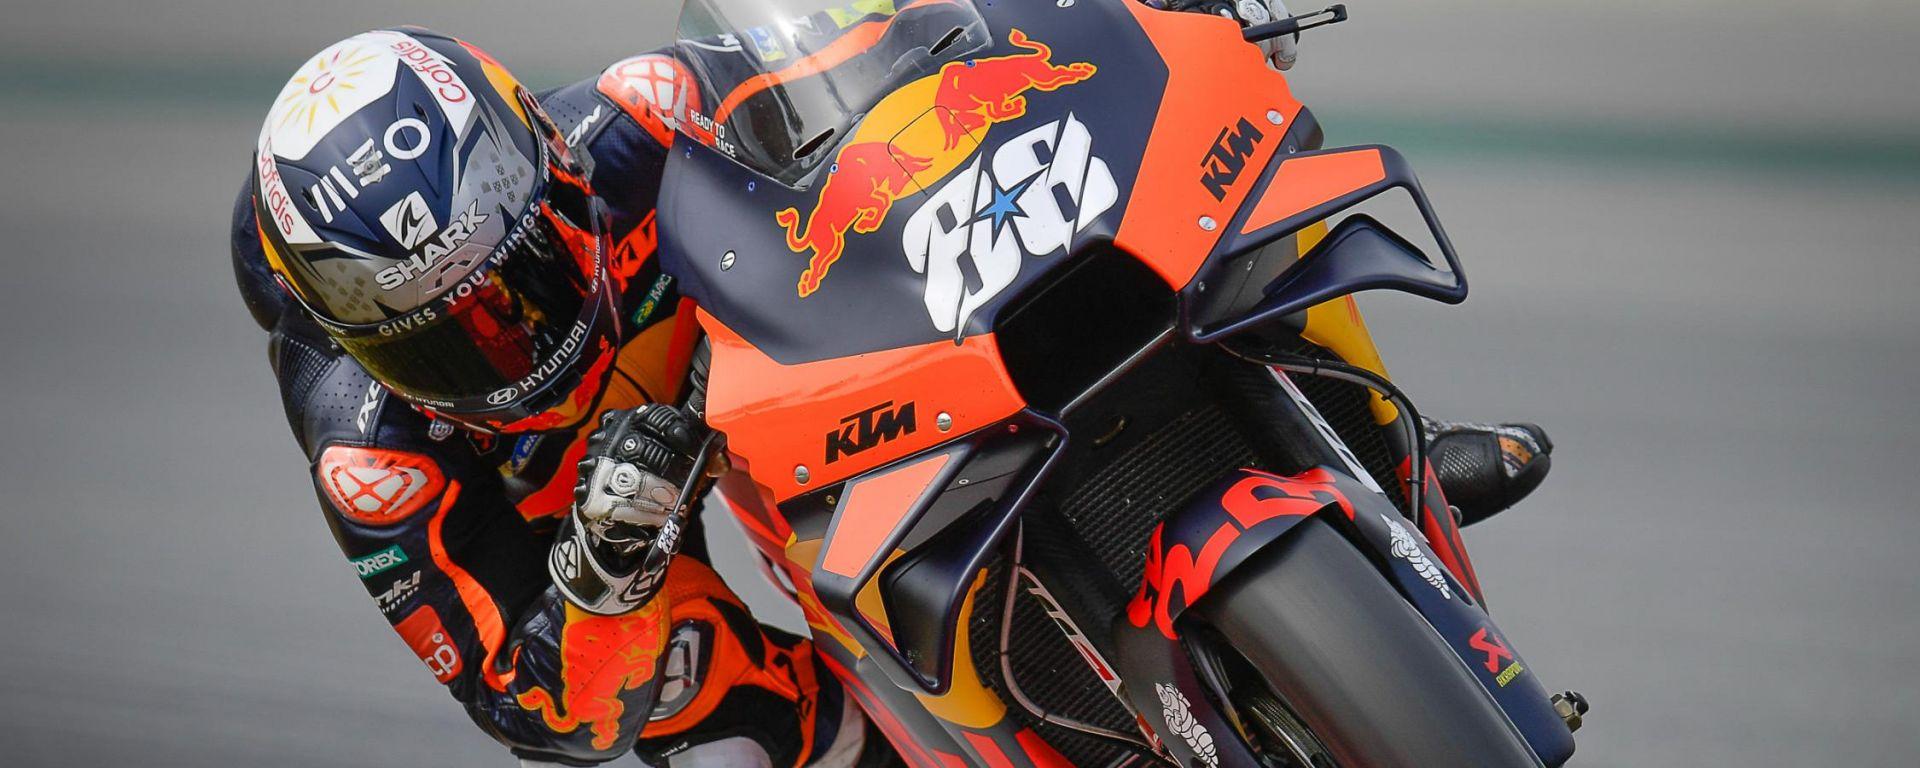 MotoGP Catalunya 2021, Montmelò: Miguel Oliveira (KTM)